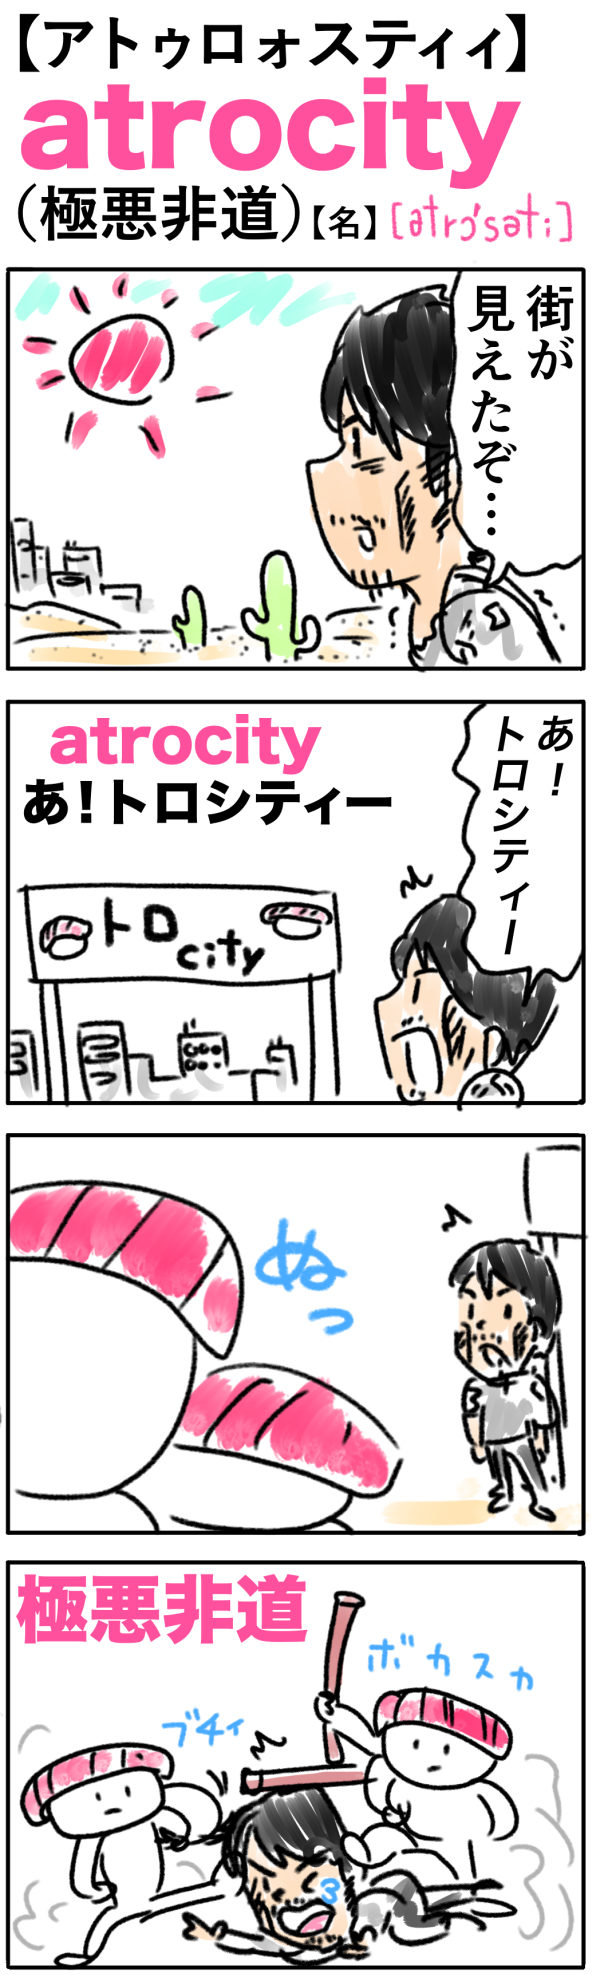 atrocity(極悪非道)の覚え方